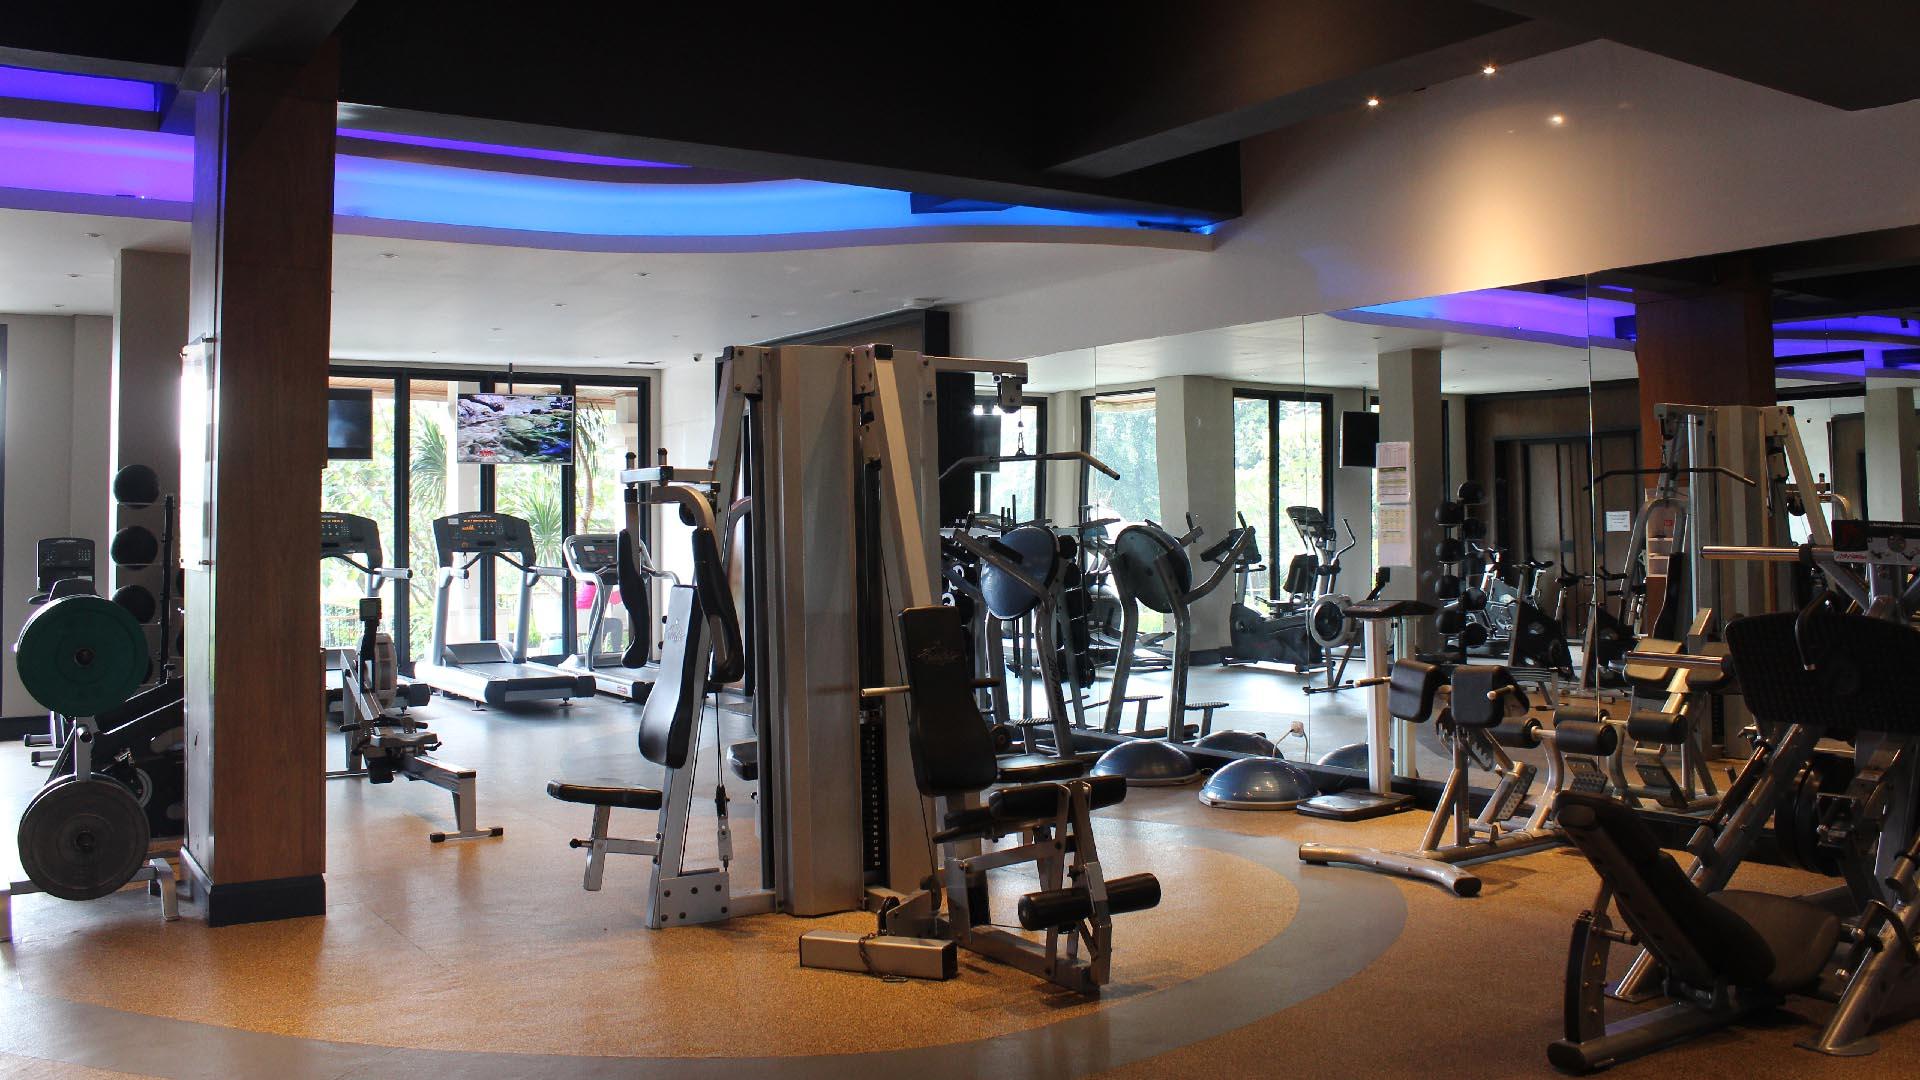 Gym & Pool - Membership - Slider-1